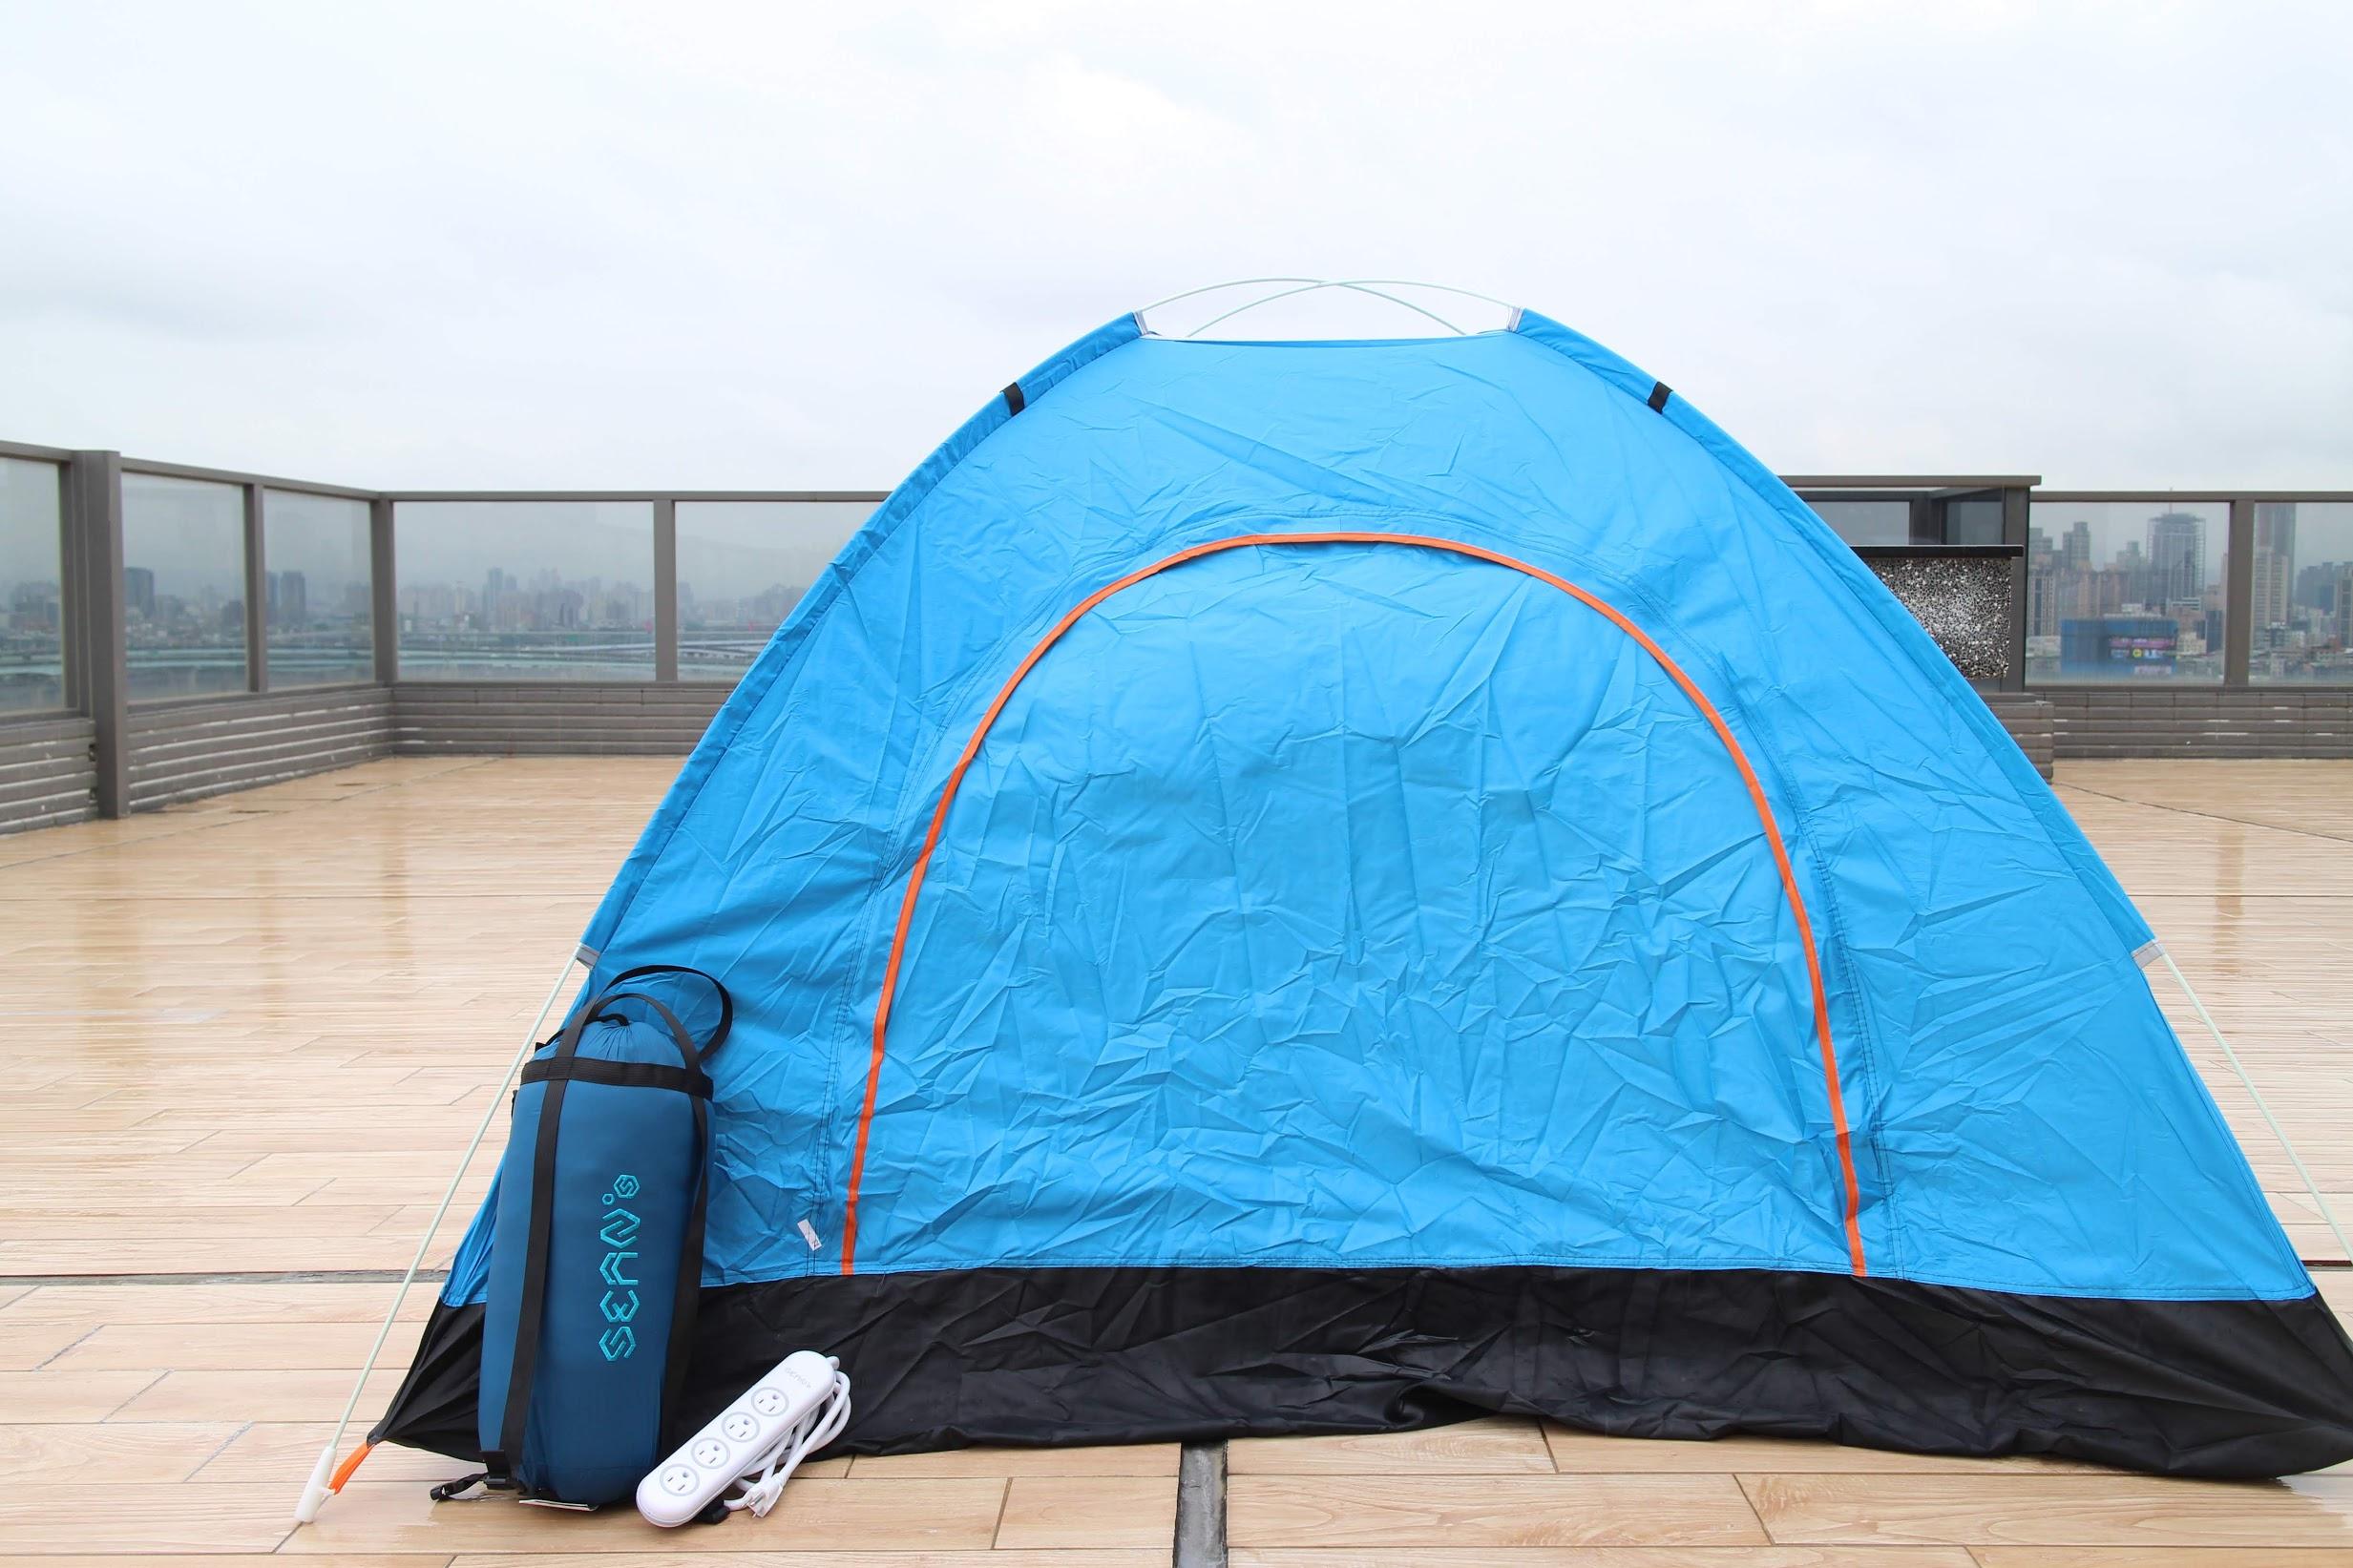 SEAN's羽絨睡袋(SNSL620信封型)、防潑水延長線推薦-露營新手必備 @秤瓶樂遊遊